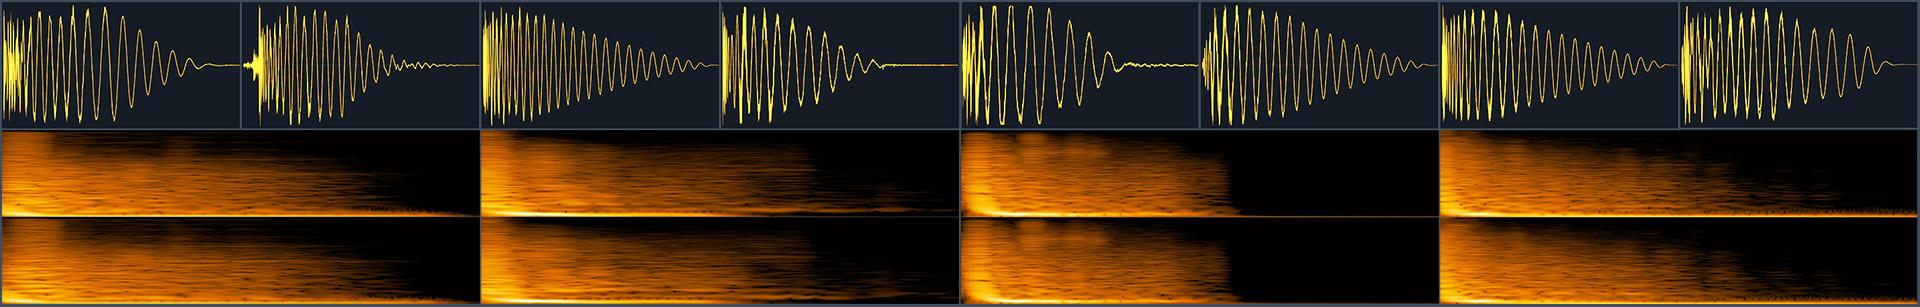 waveform collage of free kick drums samples